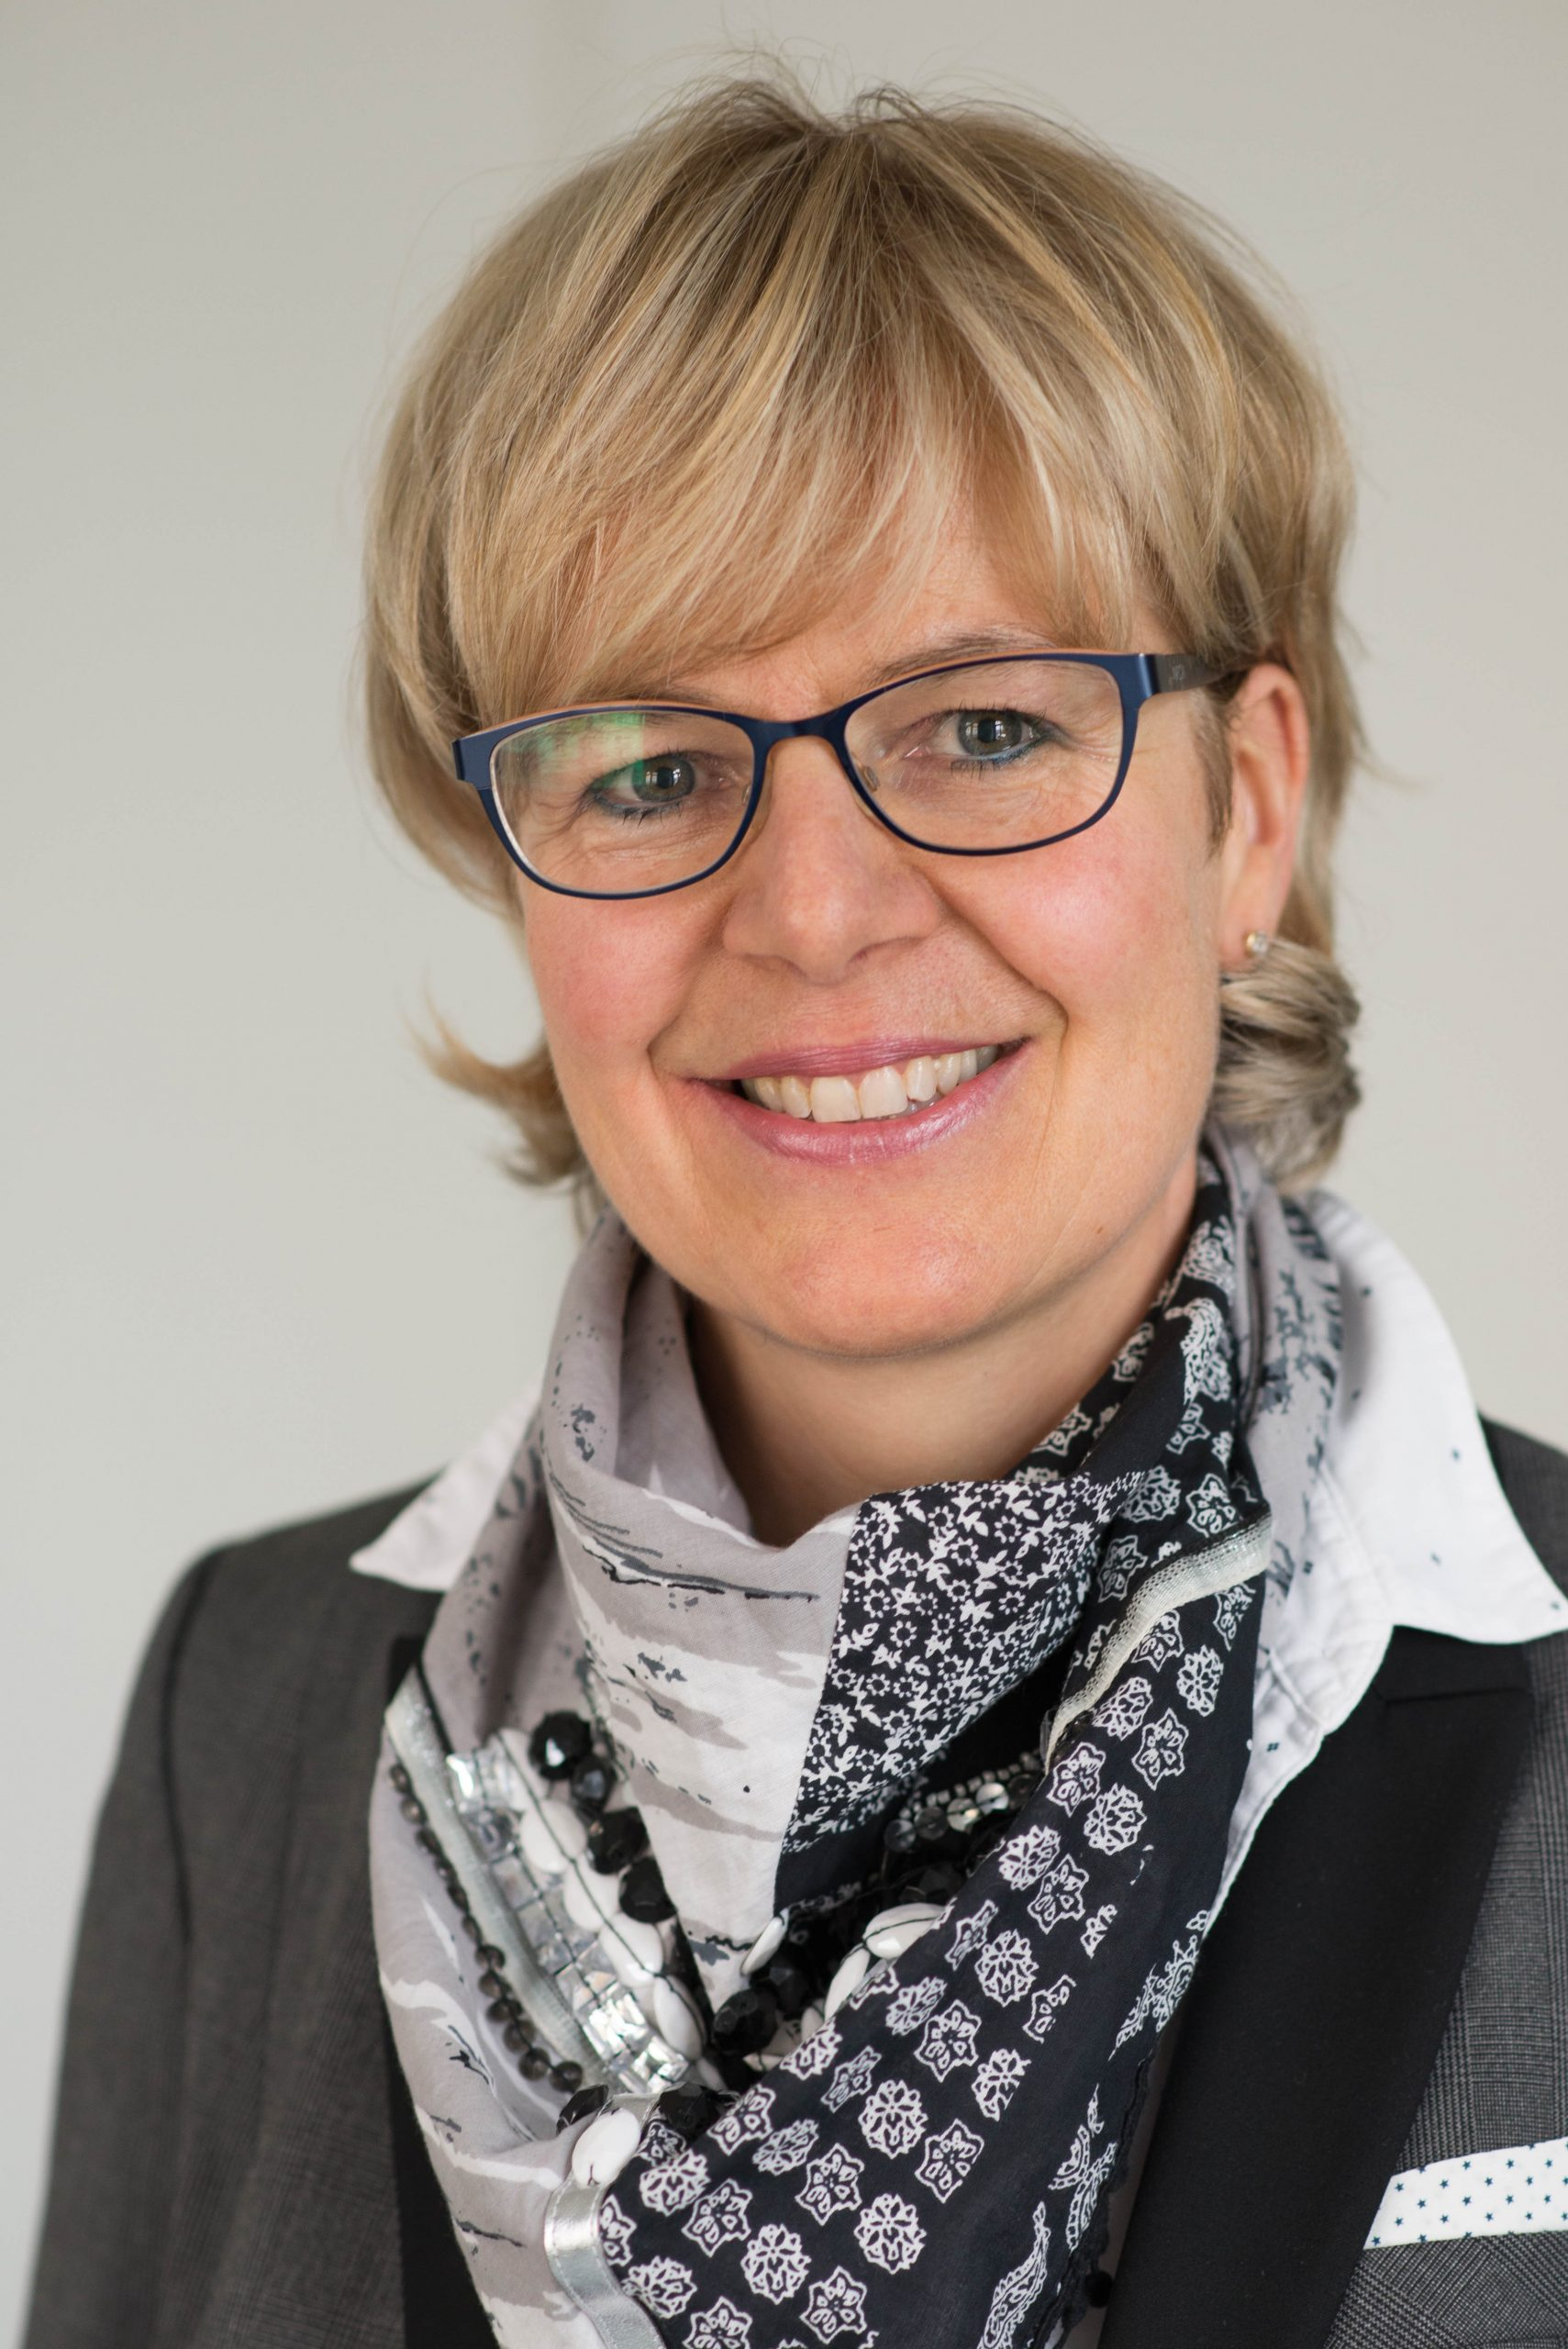 Karin Mauchle